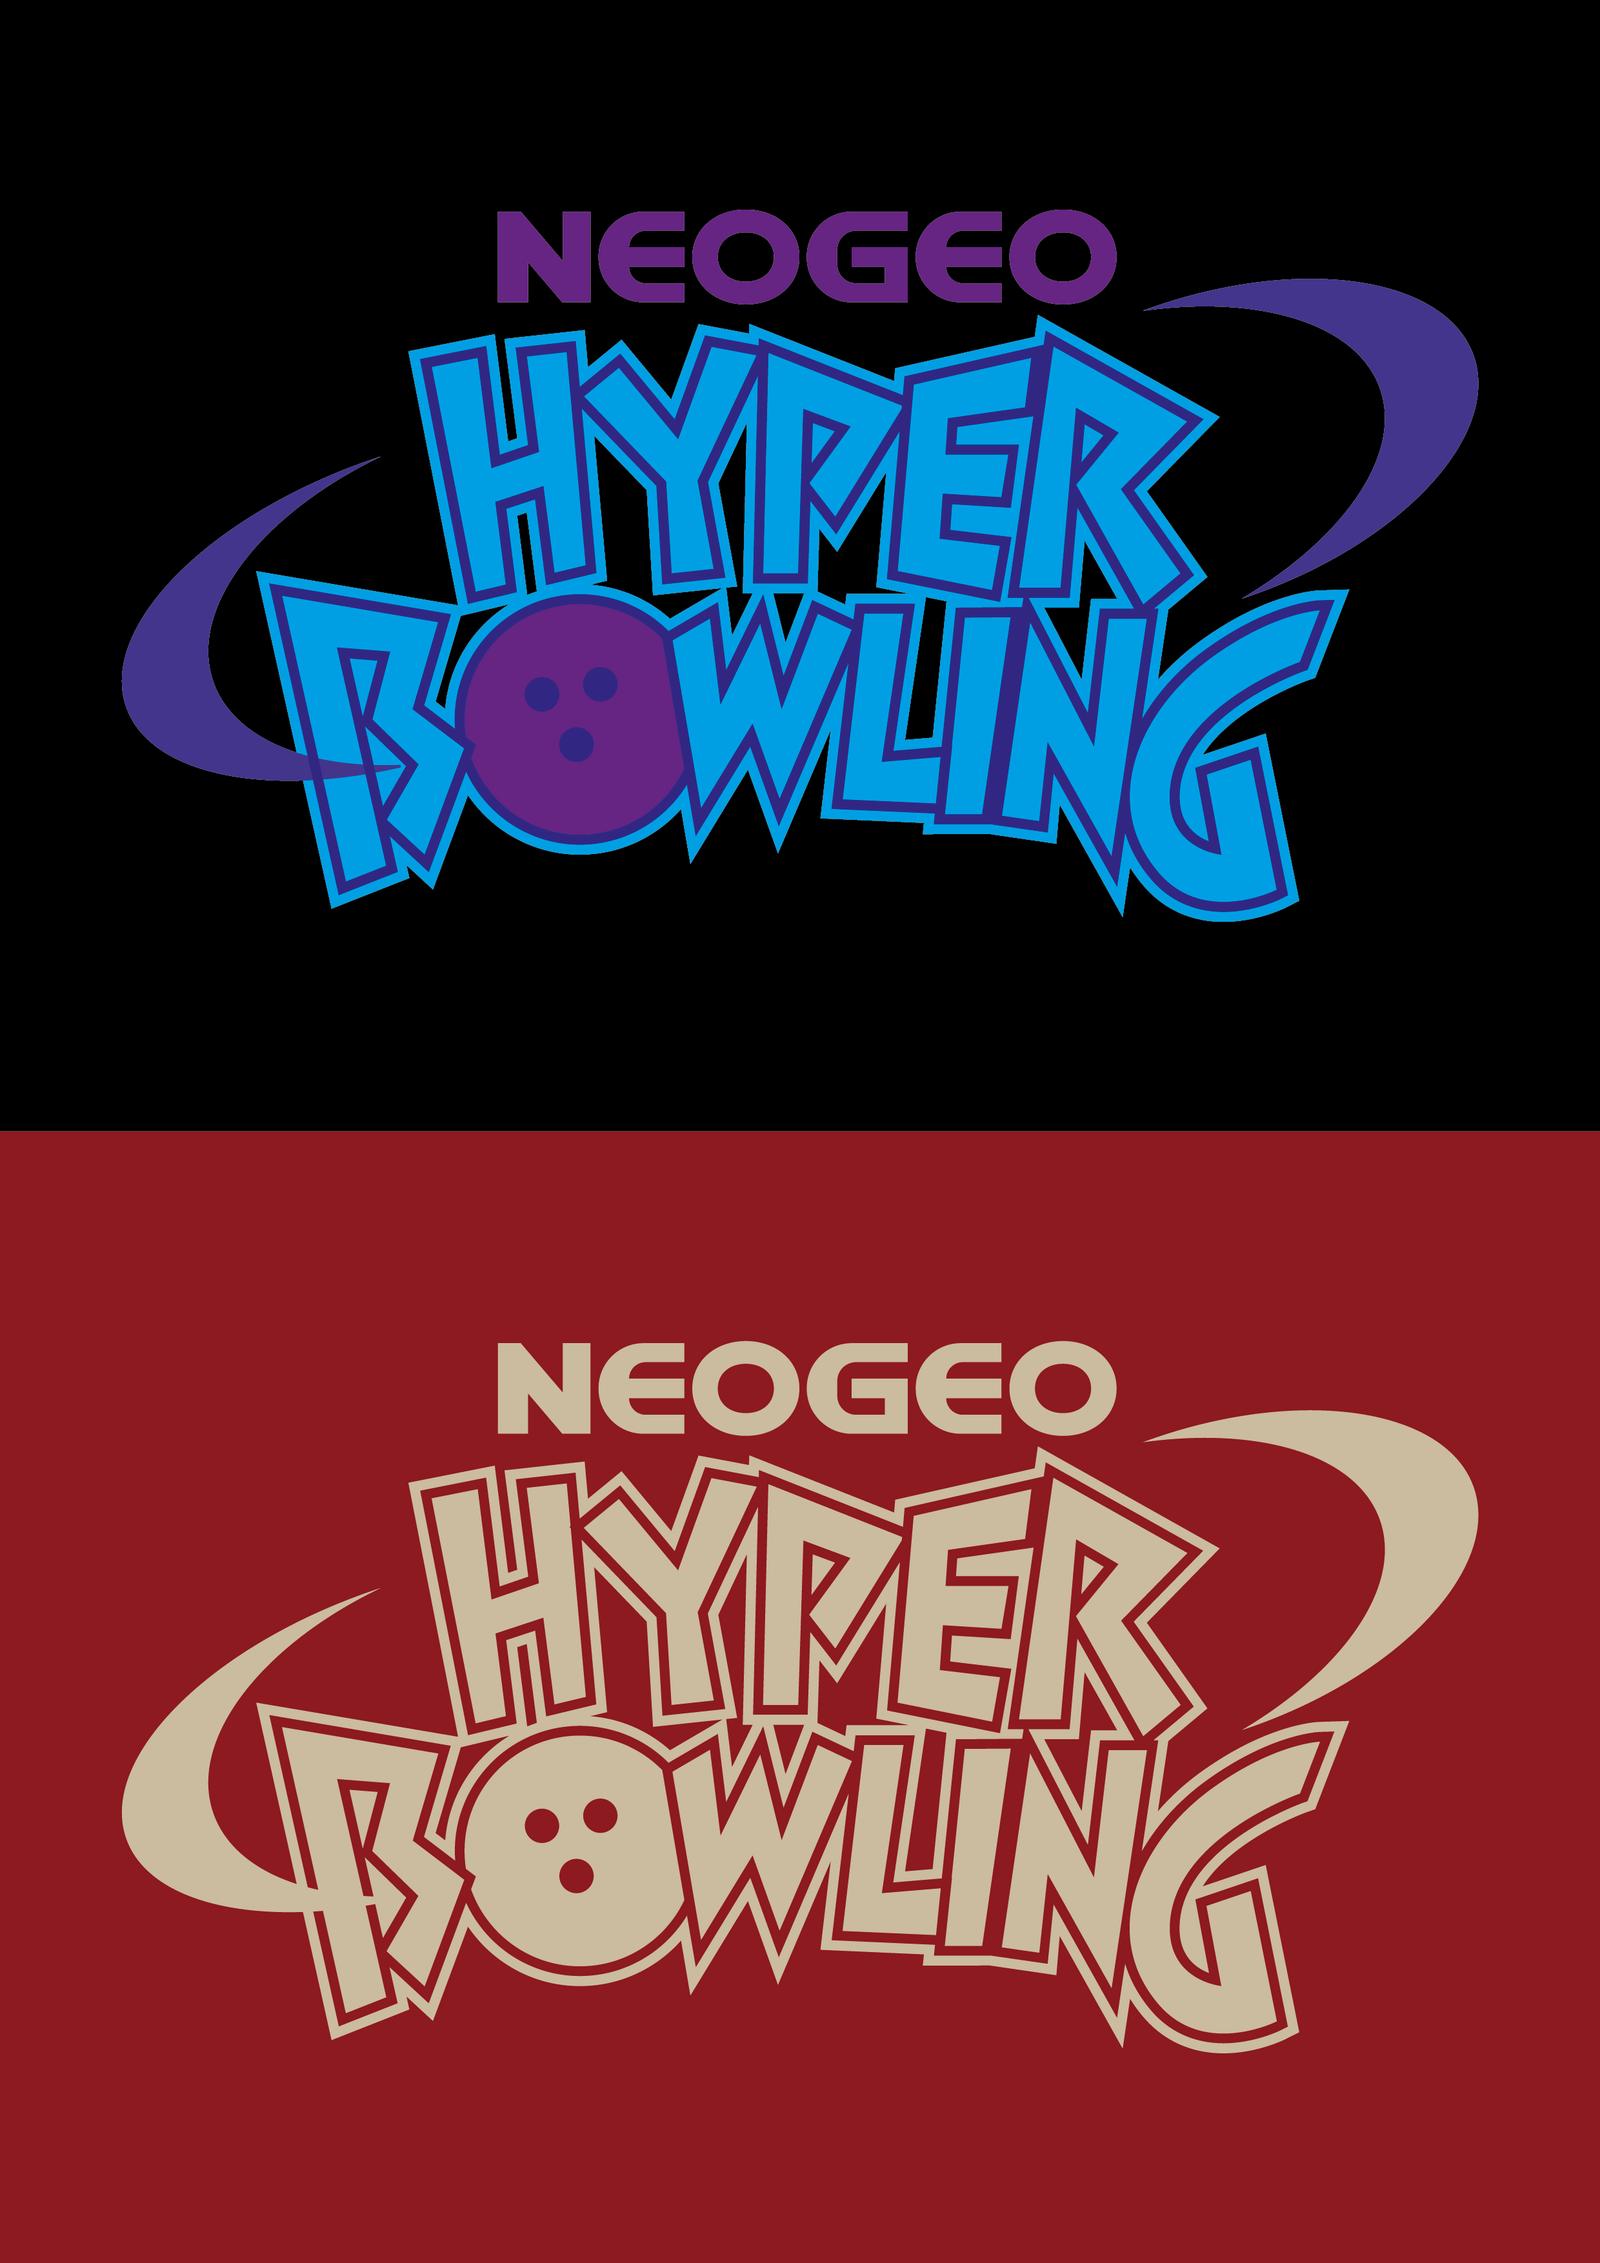 SNK NEO GEO Hyper Bowling Vector Logo by Alex Schütz aka